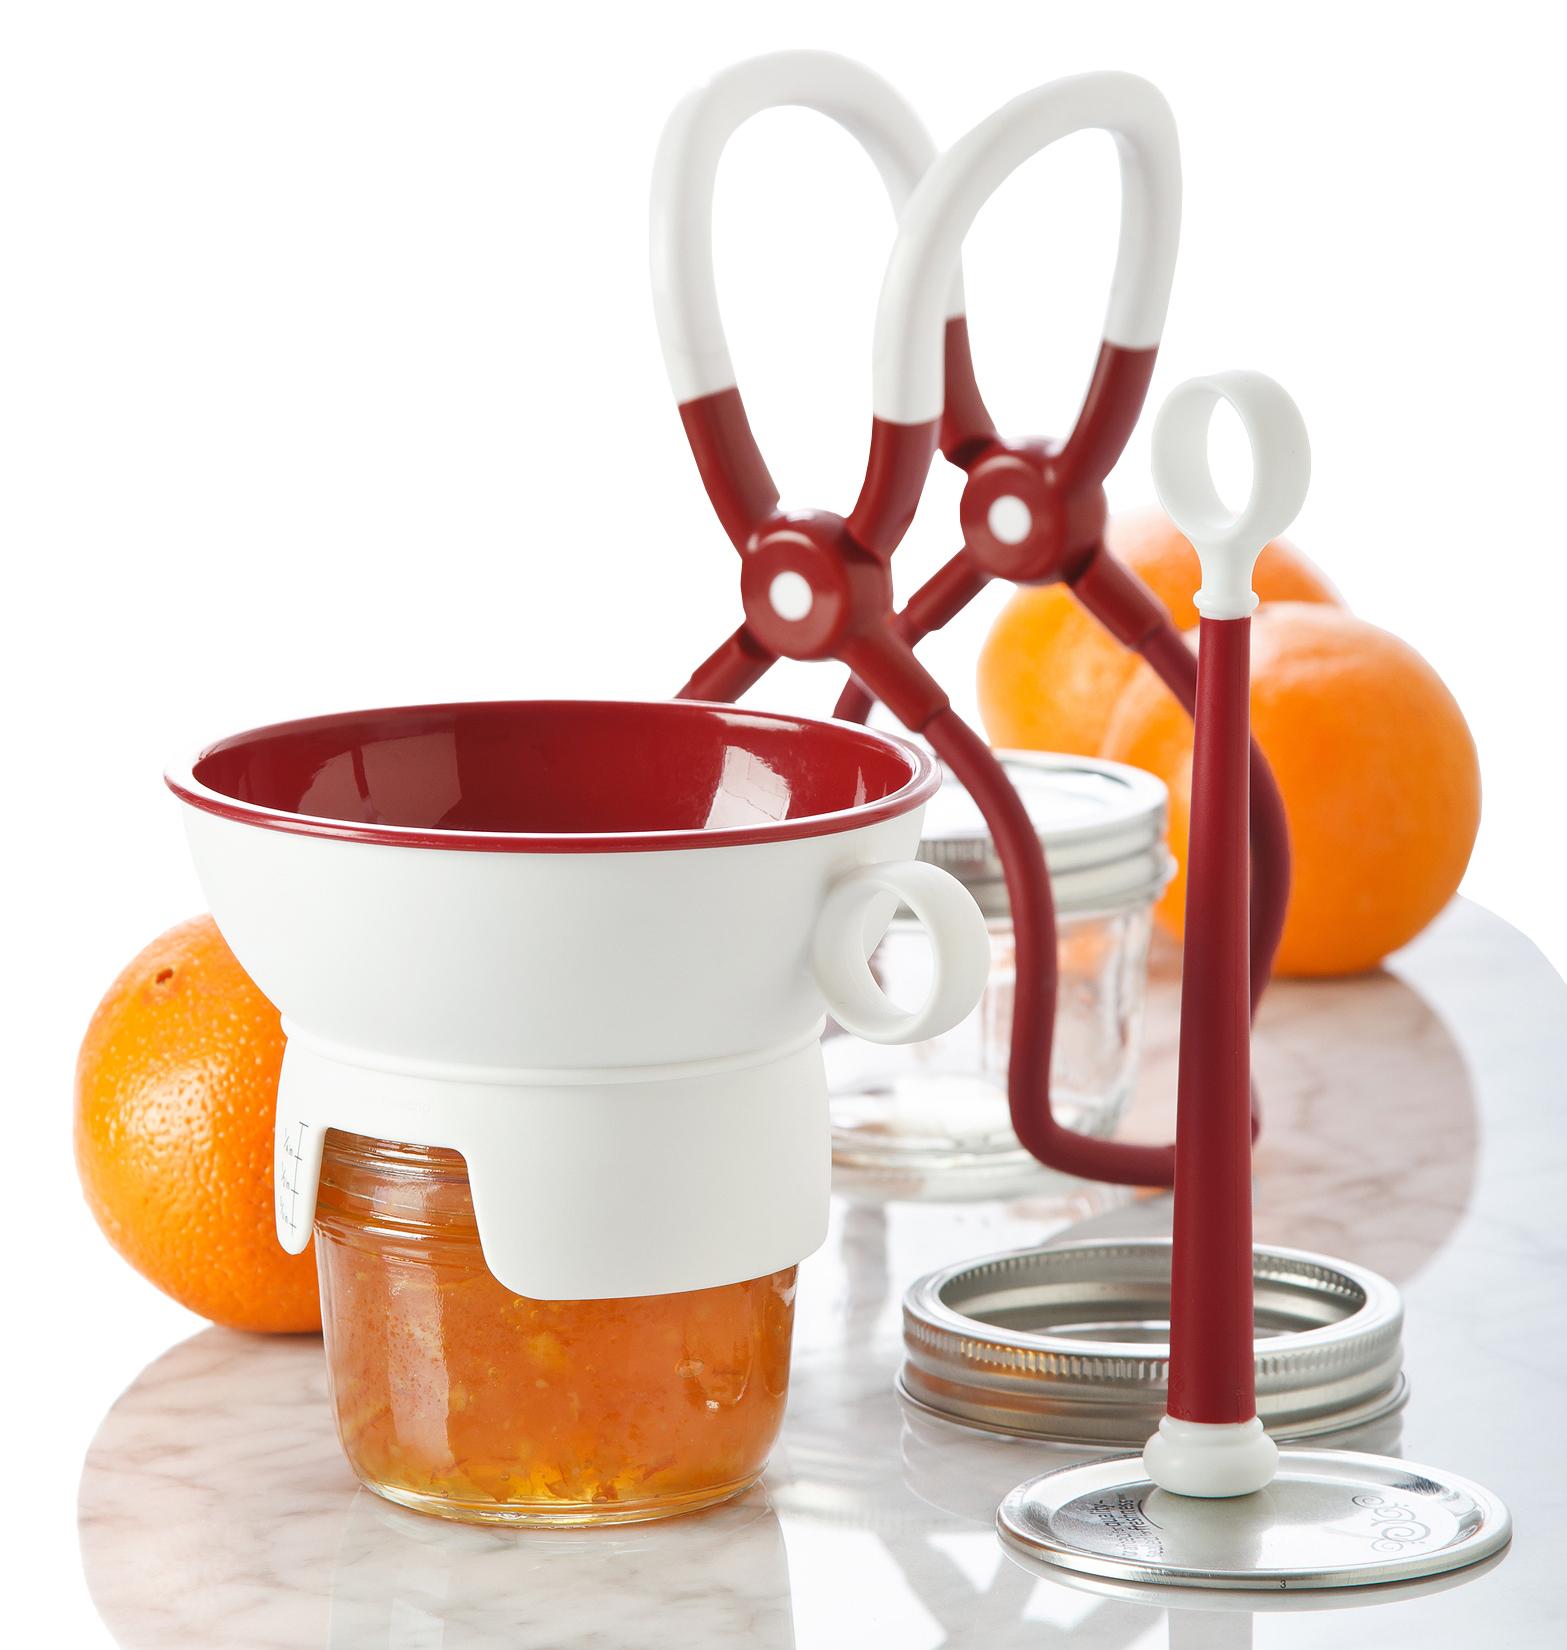 Progressive 3 piece CANNING KIT One Handed Jar Lifter/Magnetic Lid Lifter/Funnel